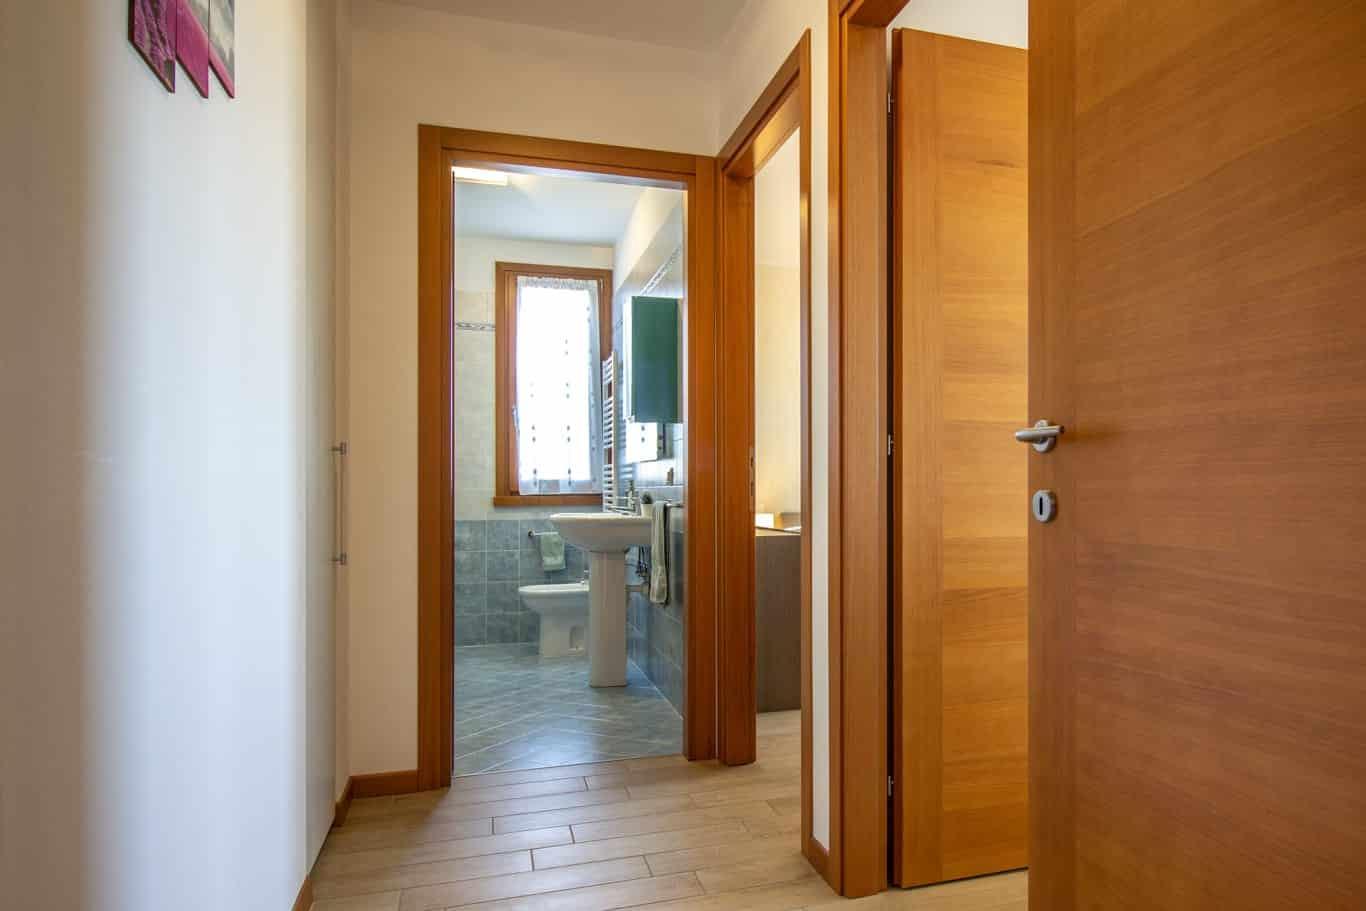 Appartamento_cimpello (3 of 8)